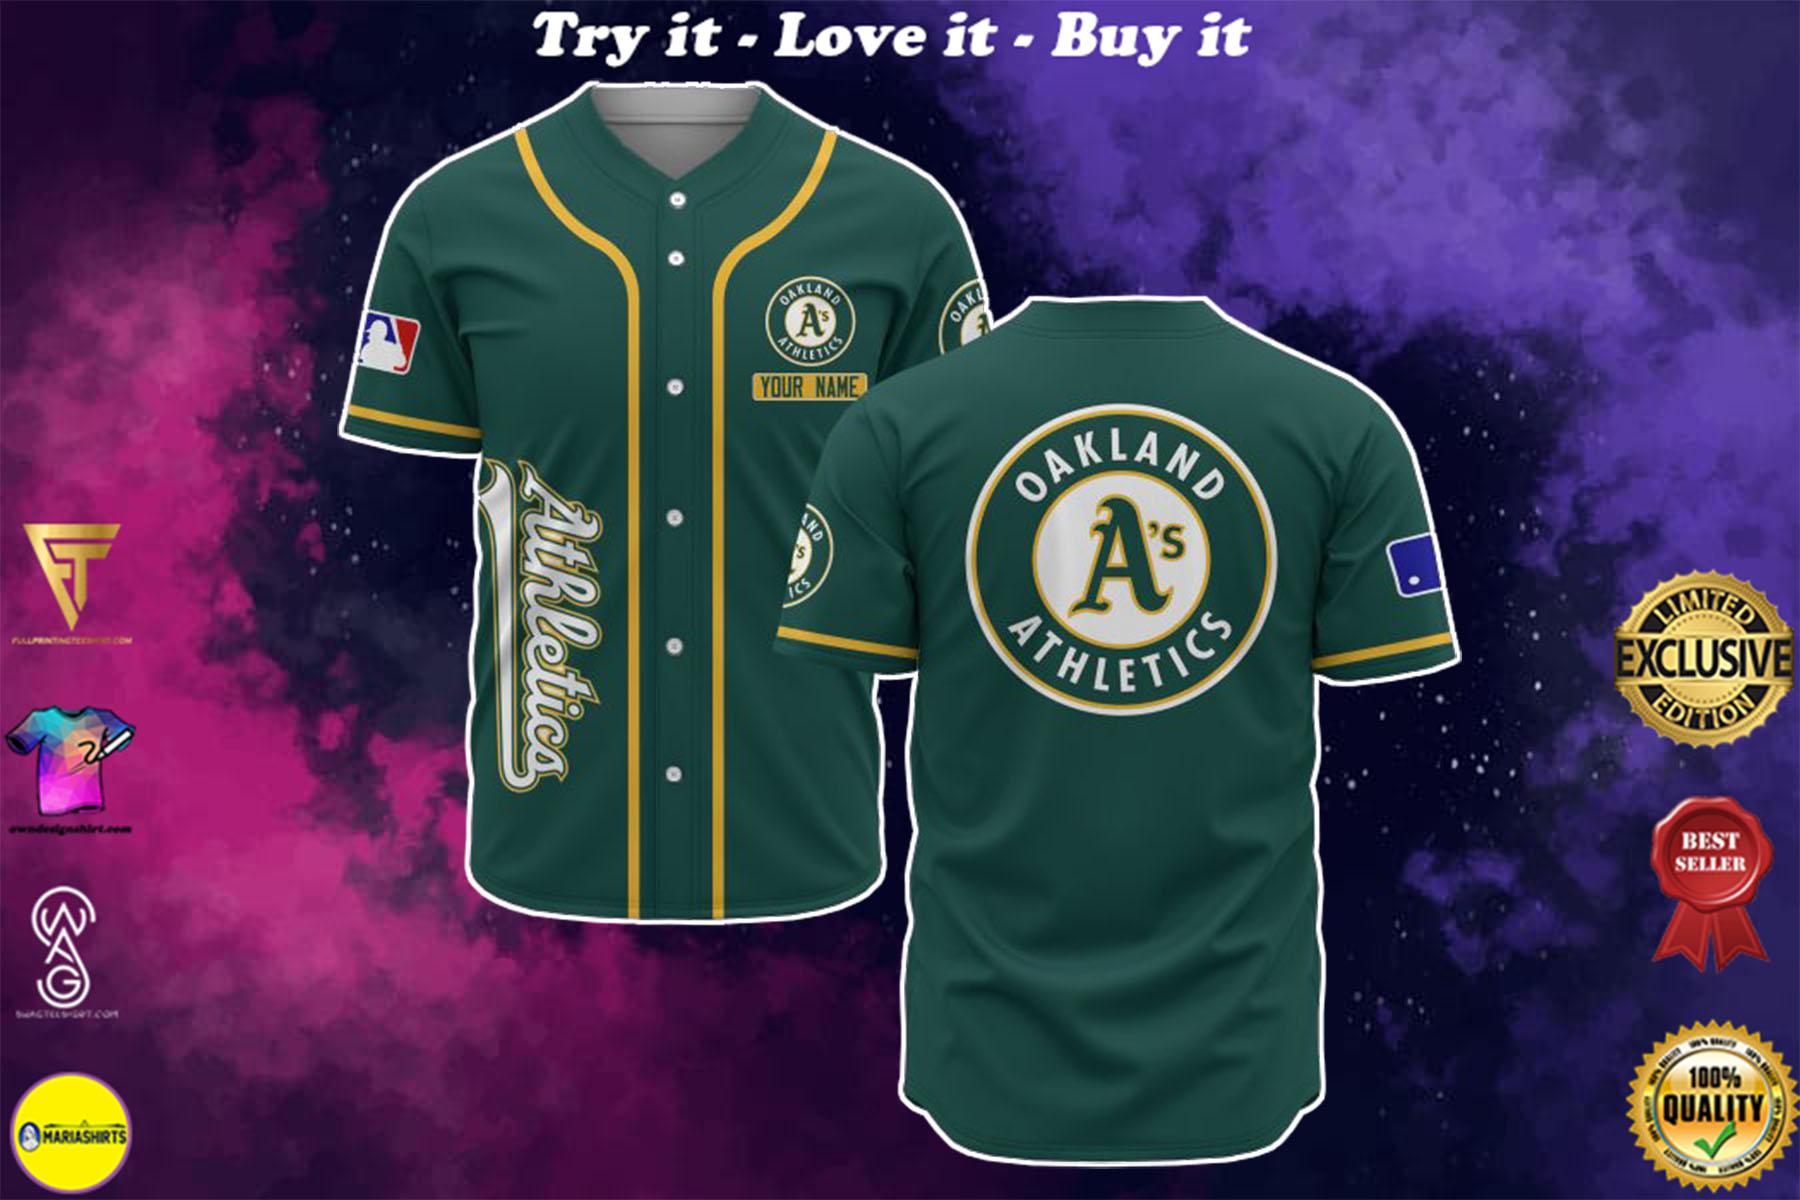 [special edition] custom name oakland athletics baseball shirt - maria